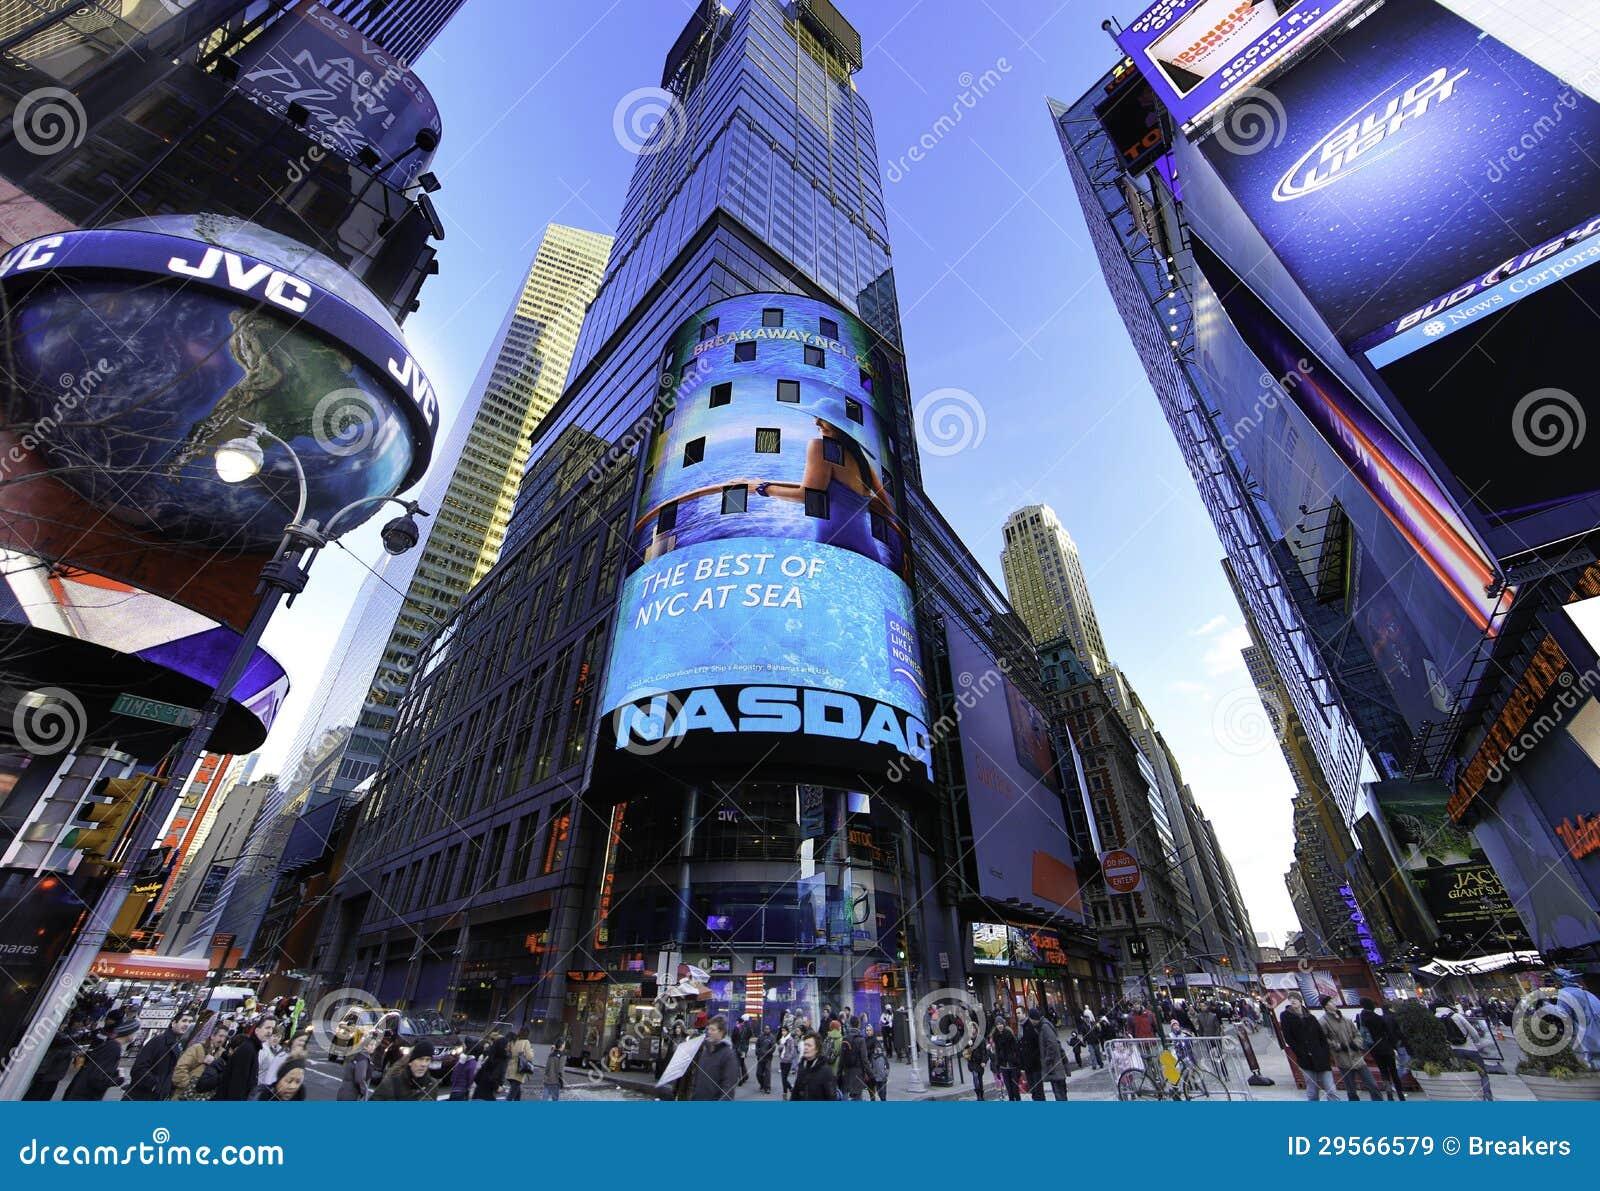 The NASDAQ Stock Market